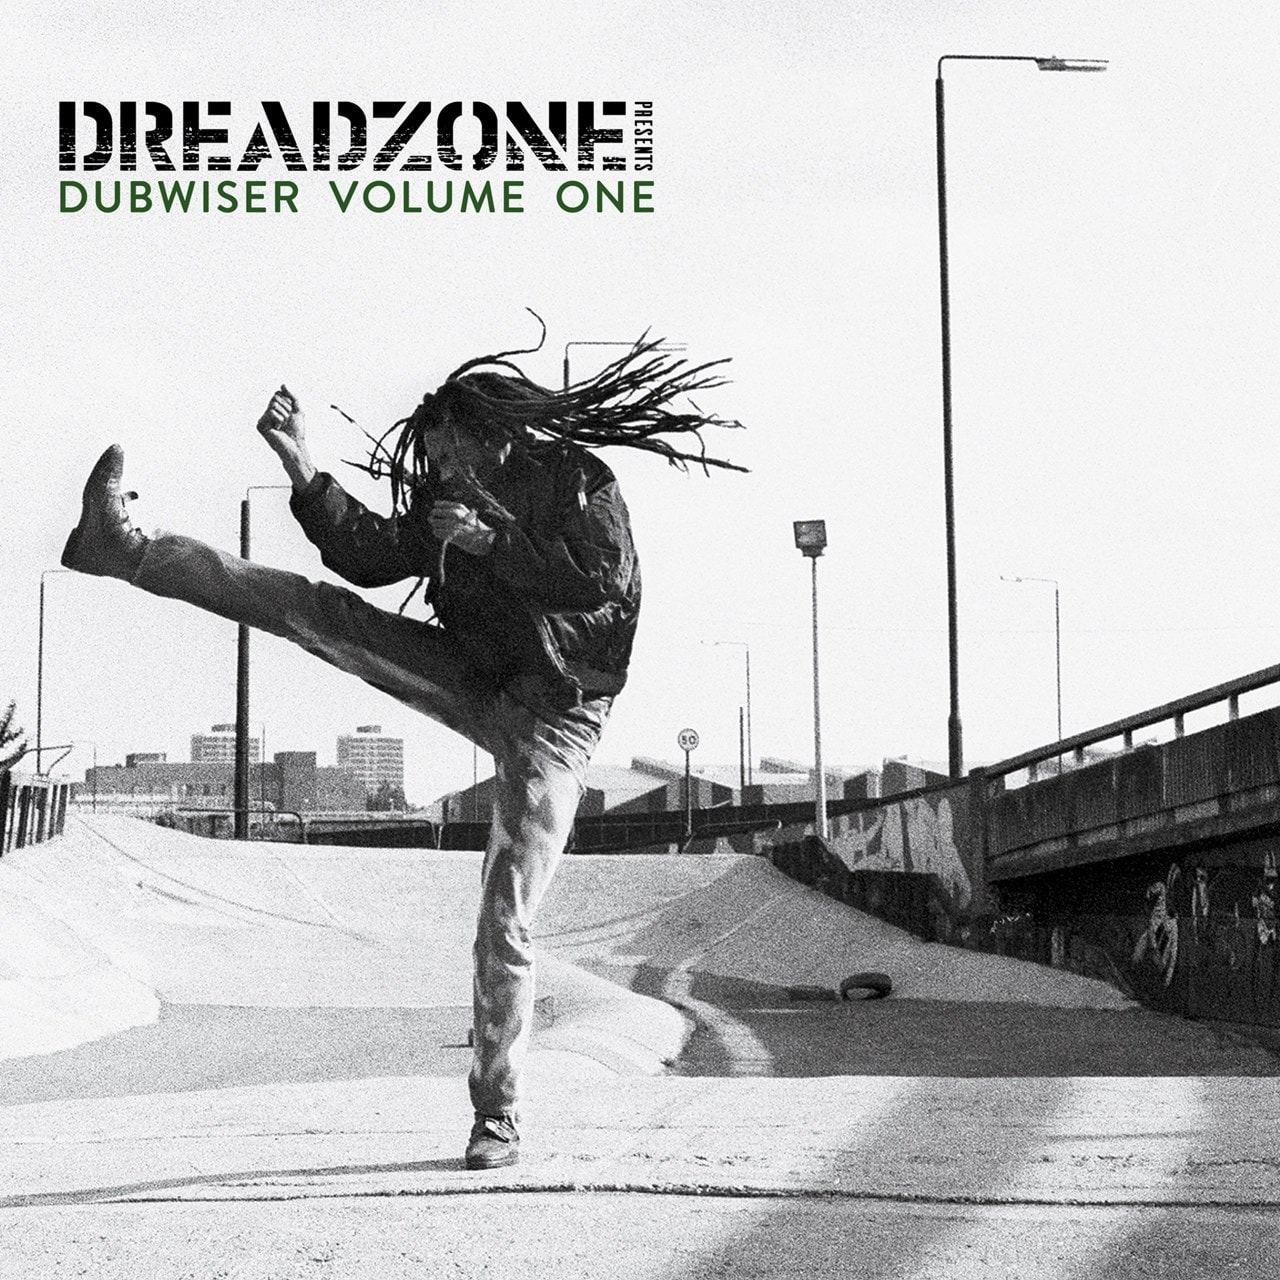 Dreadzone Presents: Dubwiser - Volume 1 - 1